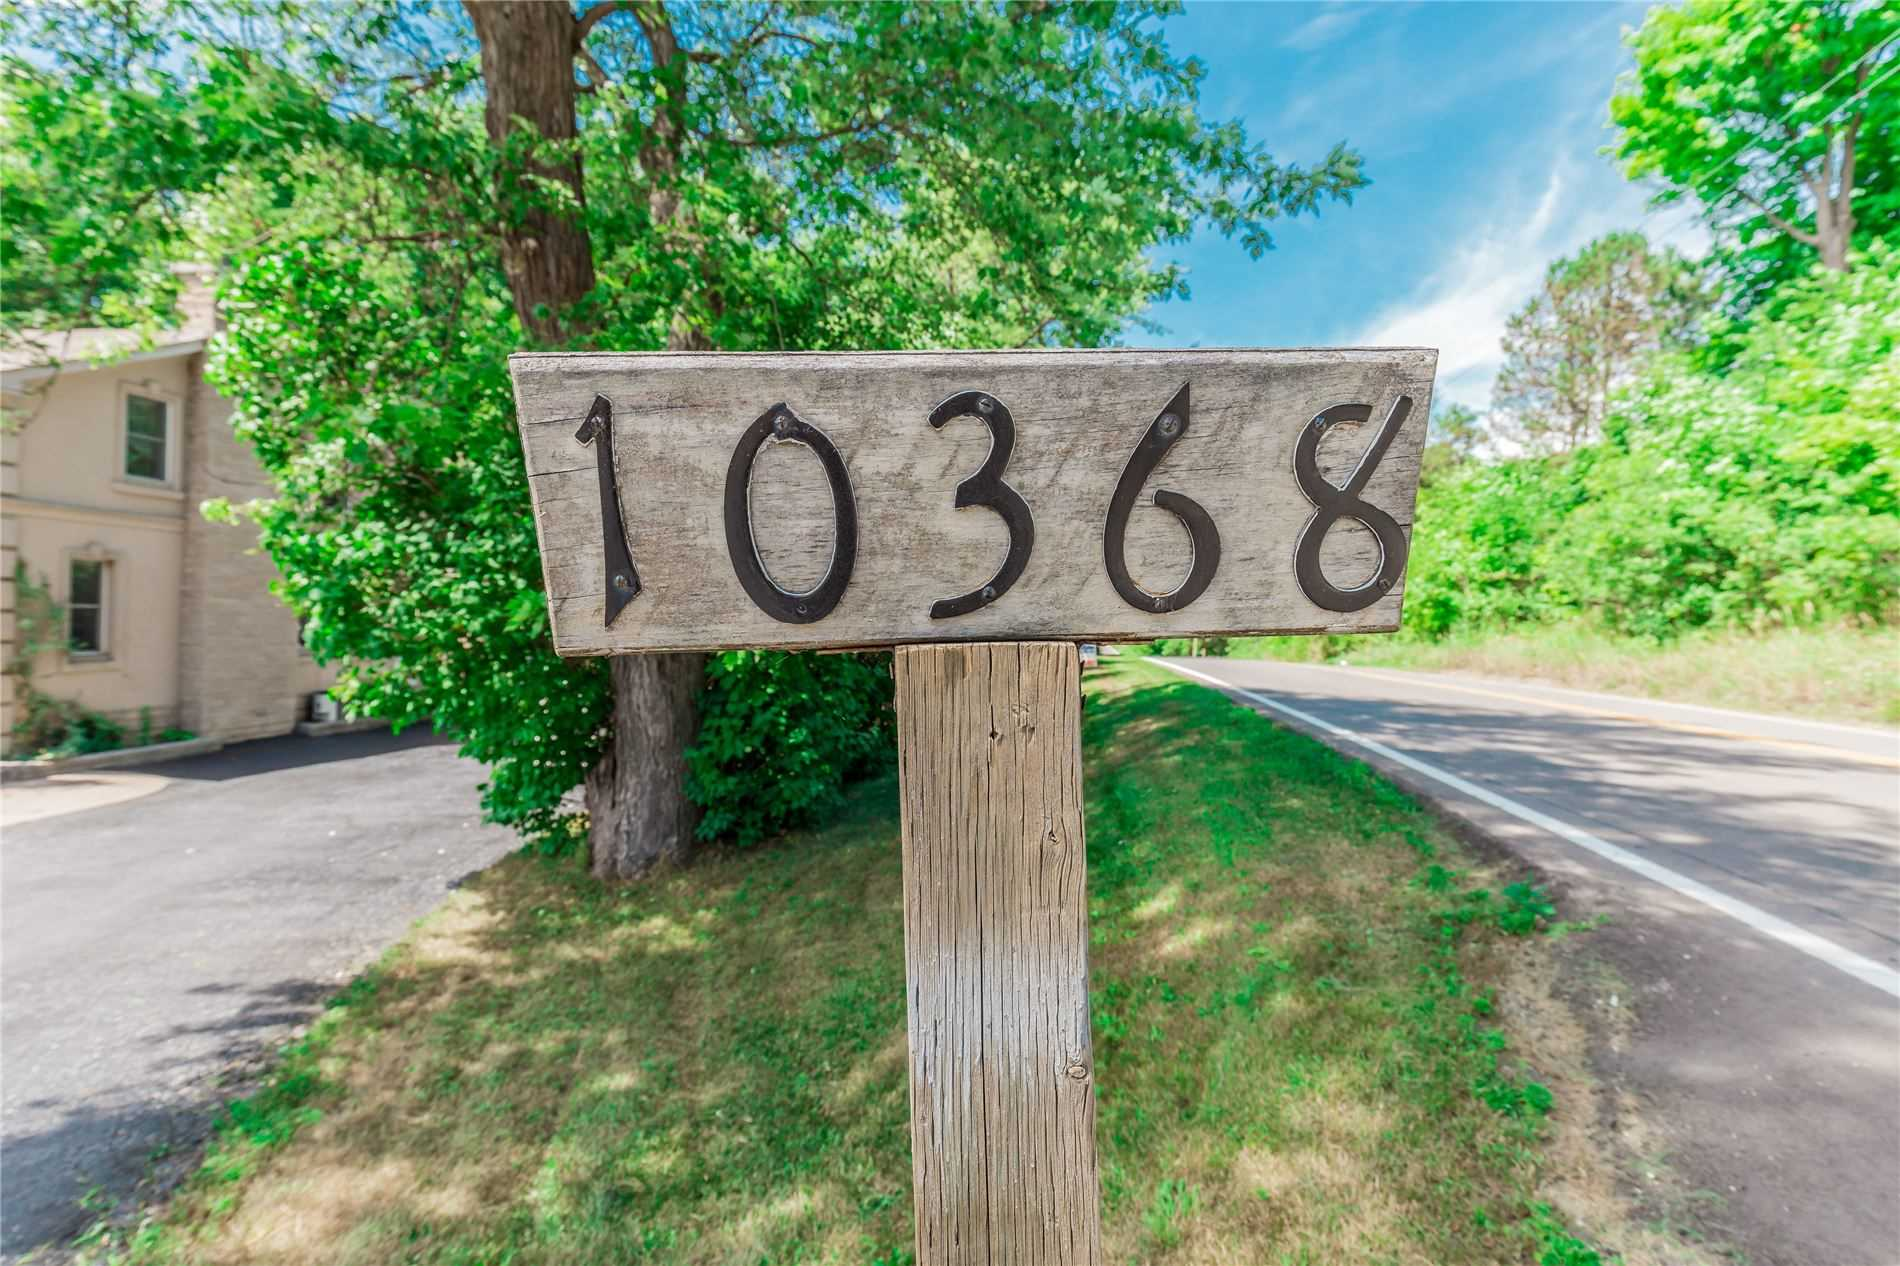 10368 Winston Churchill Blvd, Halton Hills, Ontario L7G4S7, 4 Bedrooms Bedrooms, 9 Rooms Rooms,2 BathroomsBathrooms,Detached,For Sale,Winston Churchill,W4948854